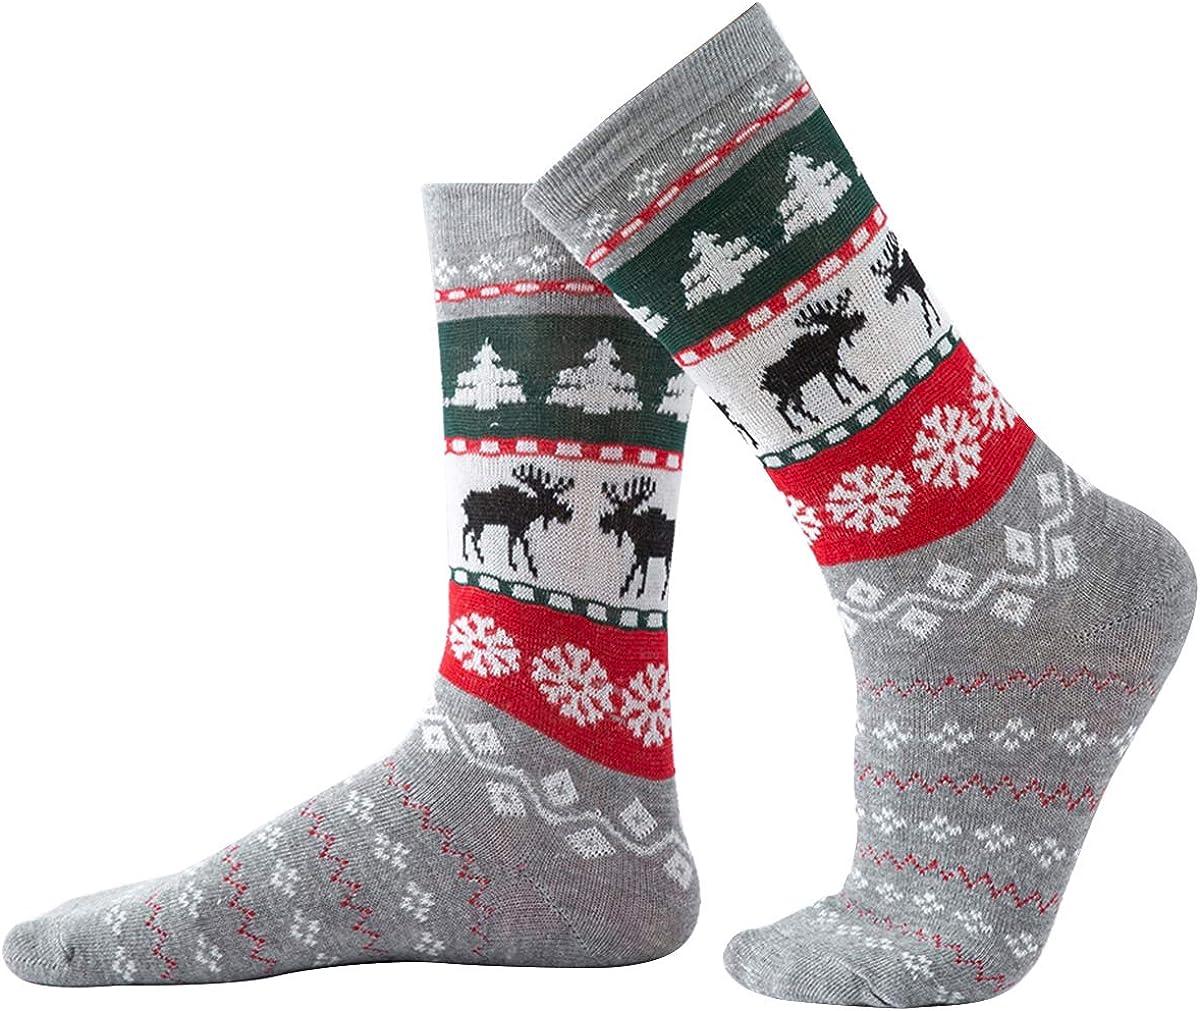 Family Christmas Matching Socks Parent-Child Socks Xmas Combed Cotton Socks for Kids Dad Mom